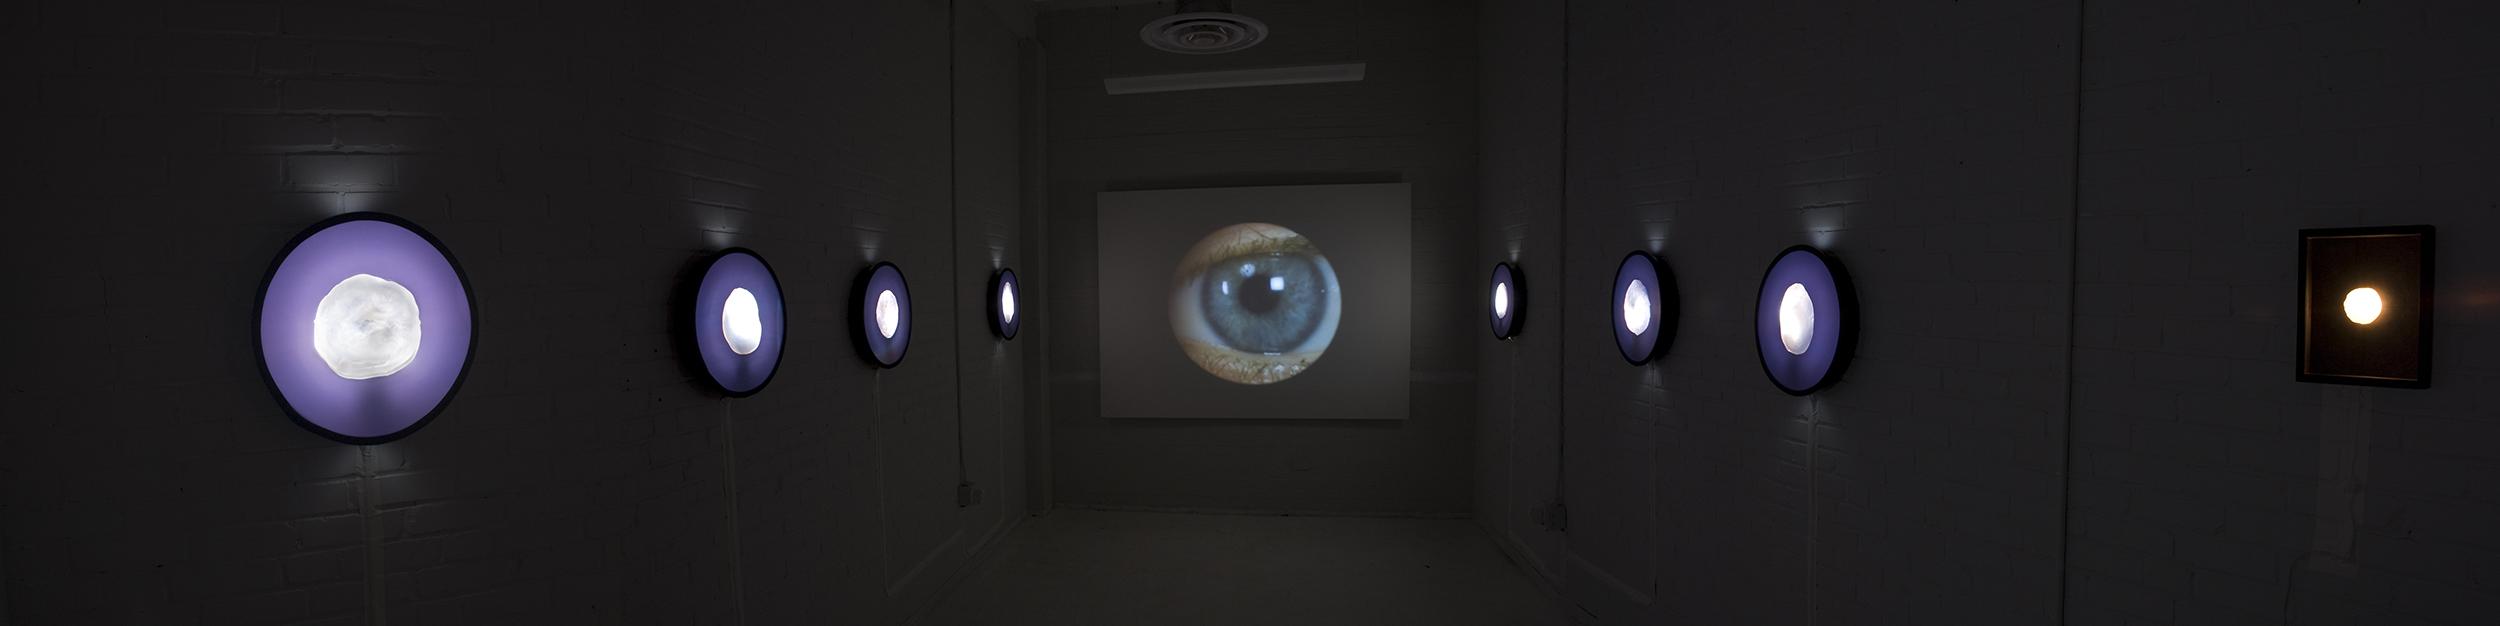 "Samples  installed at Pyramid Atlantic Gallery, Silverspring, Maryland, 2008. 17X17"" Duratrans transparencies on lighboxes, silicone imprint, video loop."